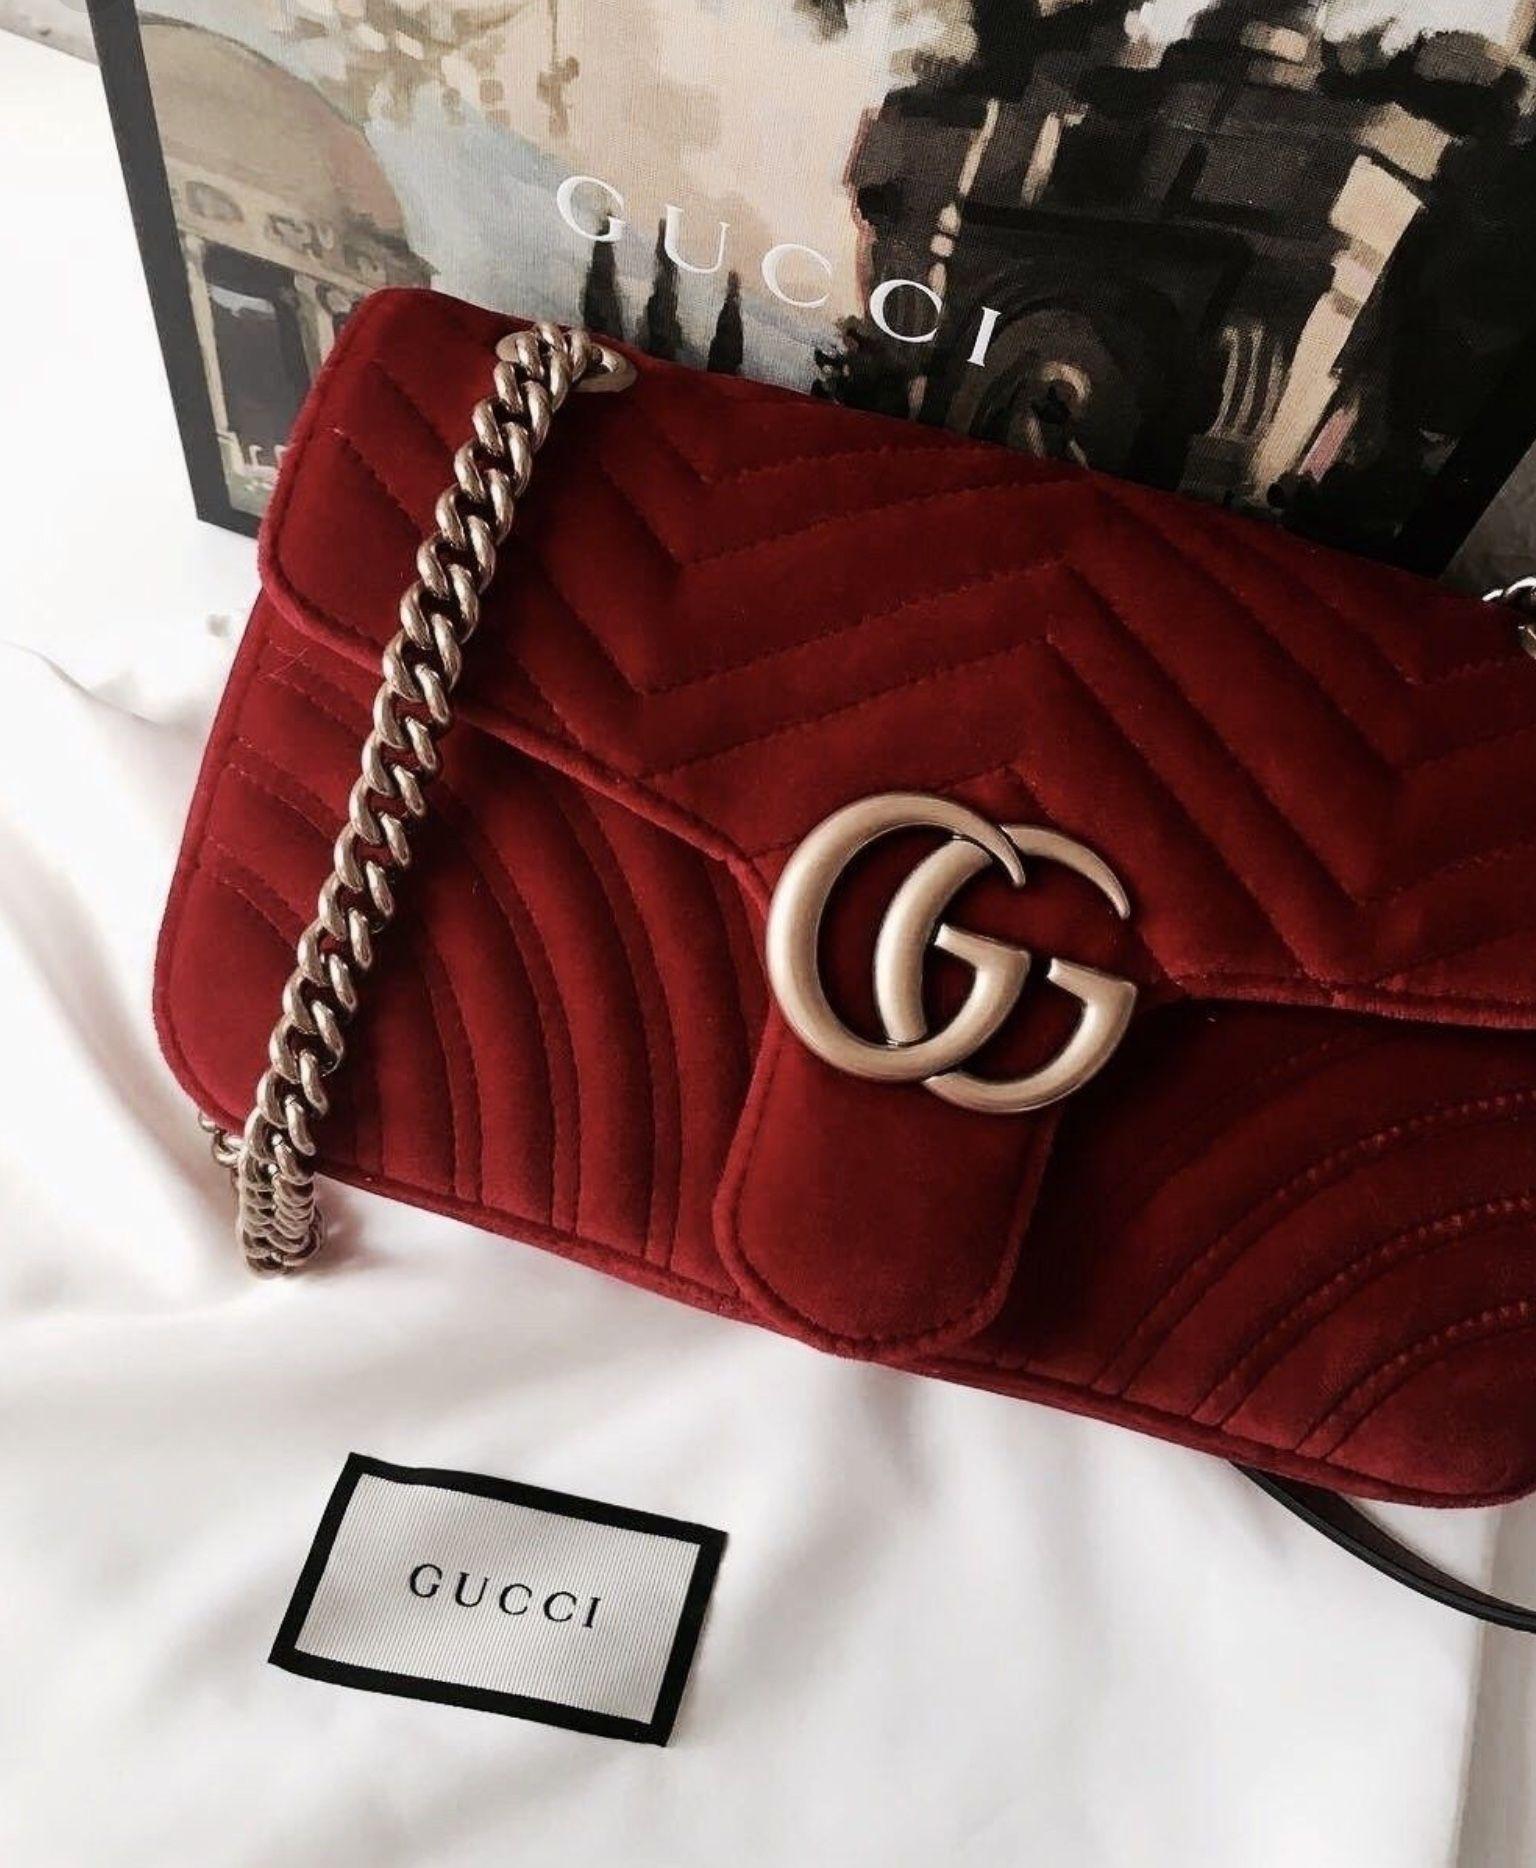 e5717ca3159b gucci #bag #fashion #handbag #expensive #guccibag | designer bags ...